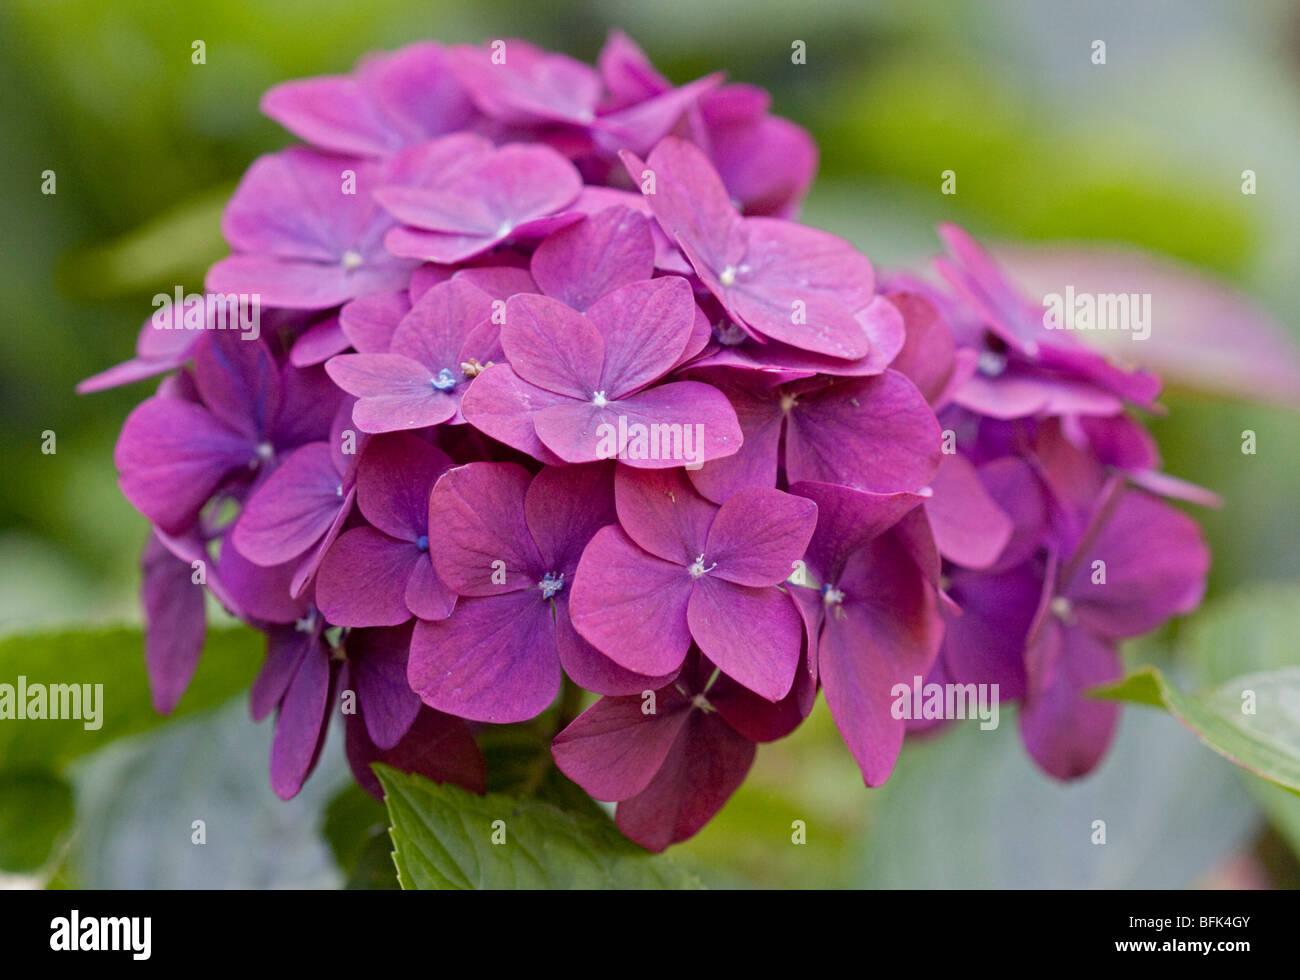 Pink Hydrangea - Stock Image